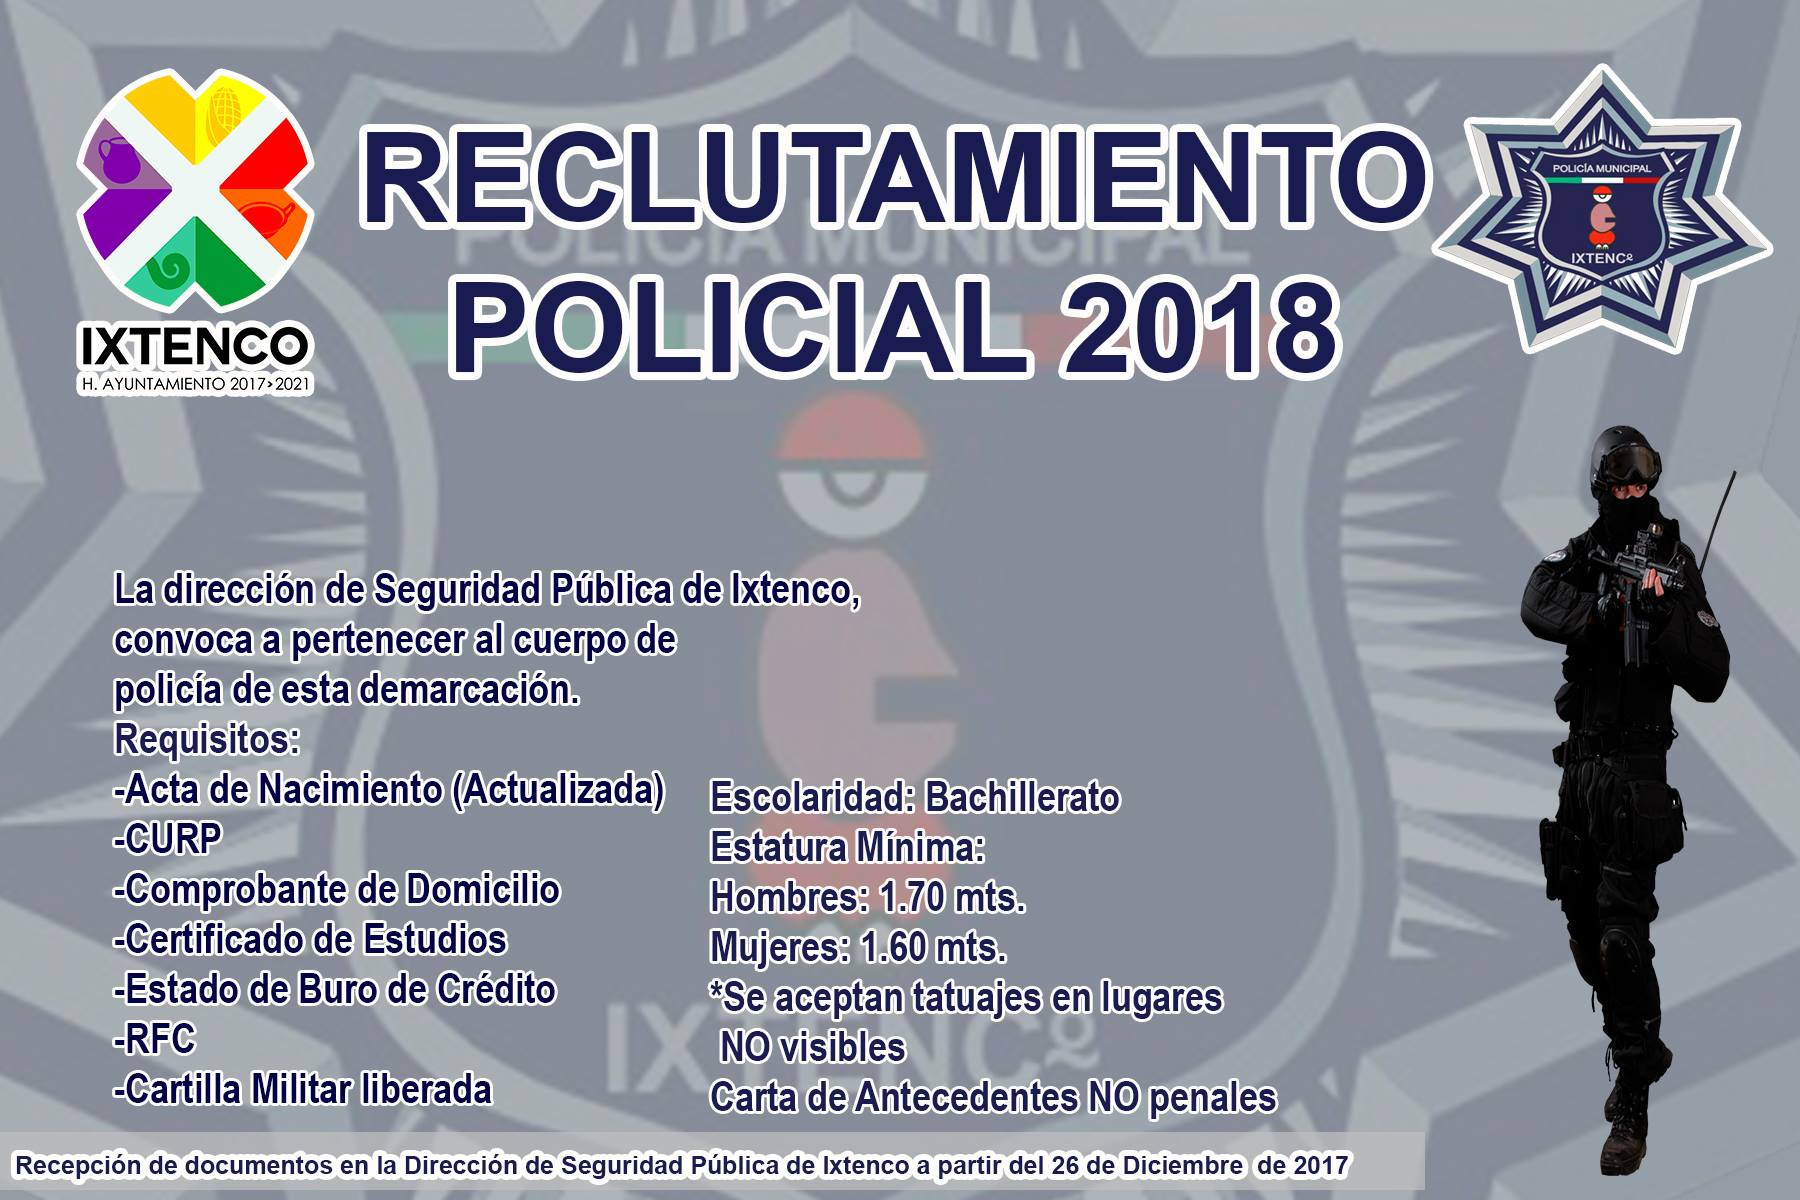 Abren convocatoria para ingresar a la Policía Municipal de Ixtenco